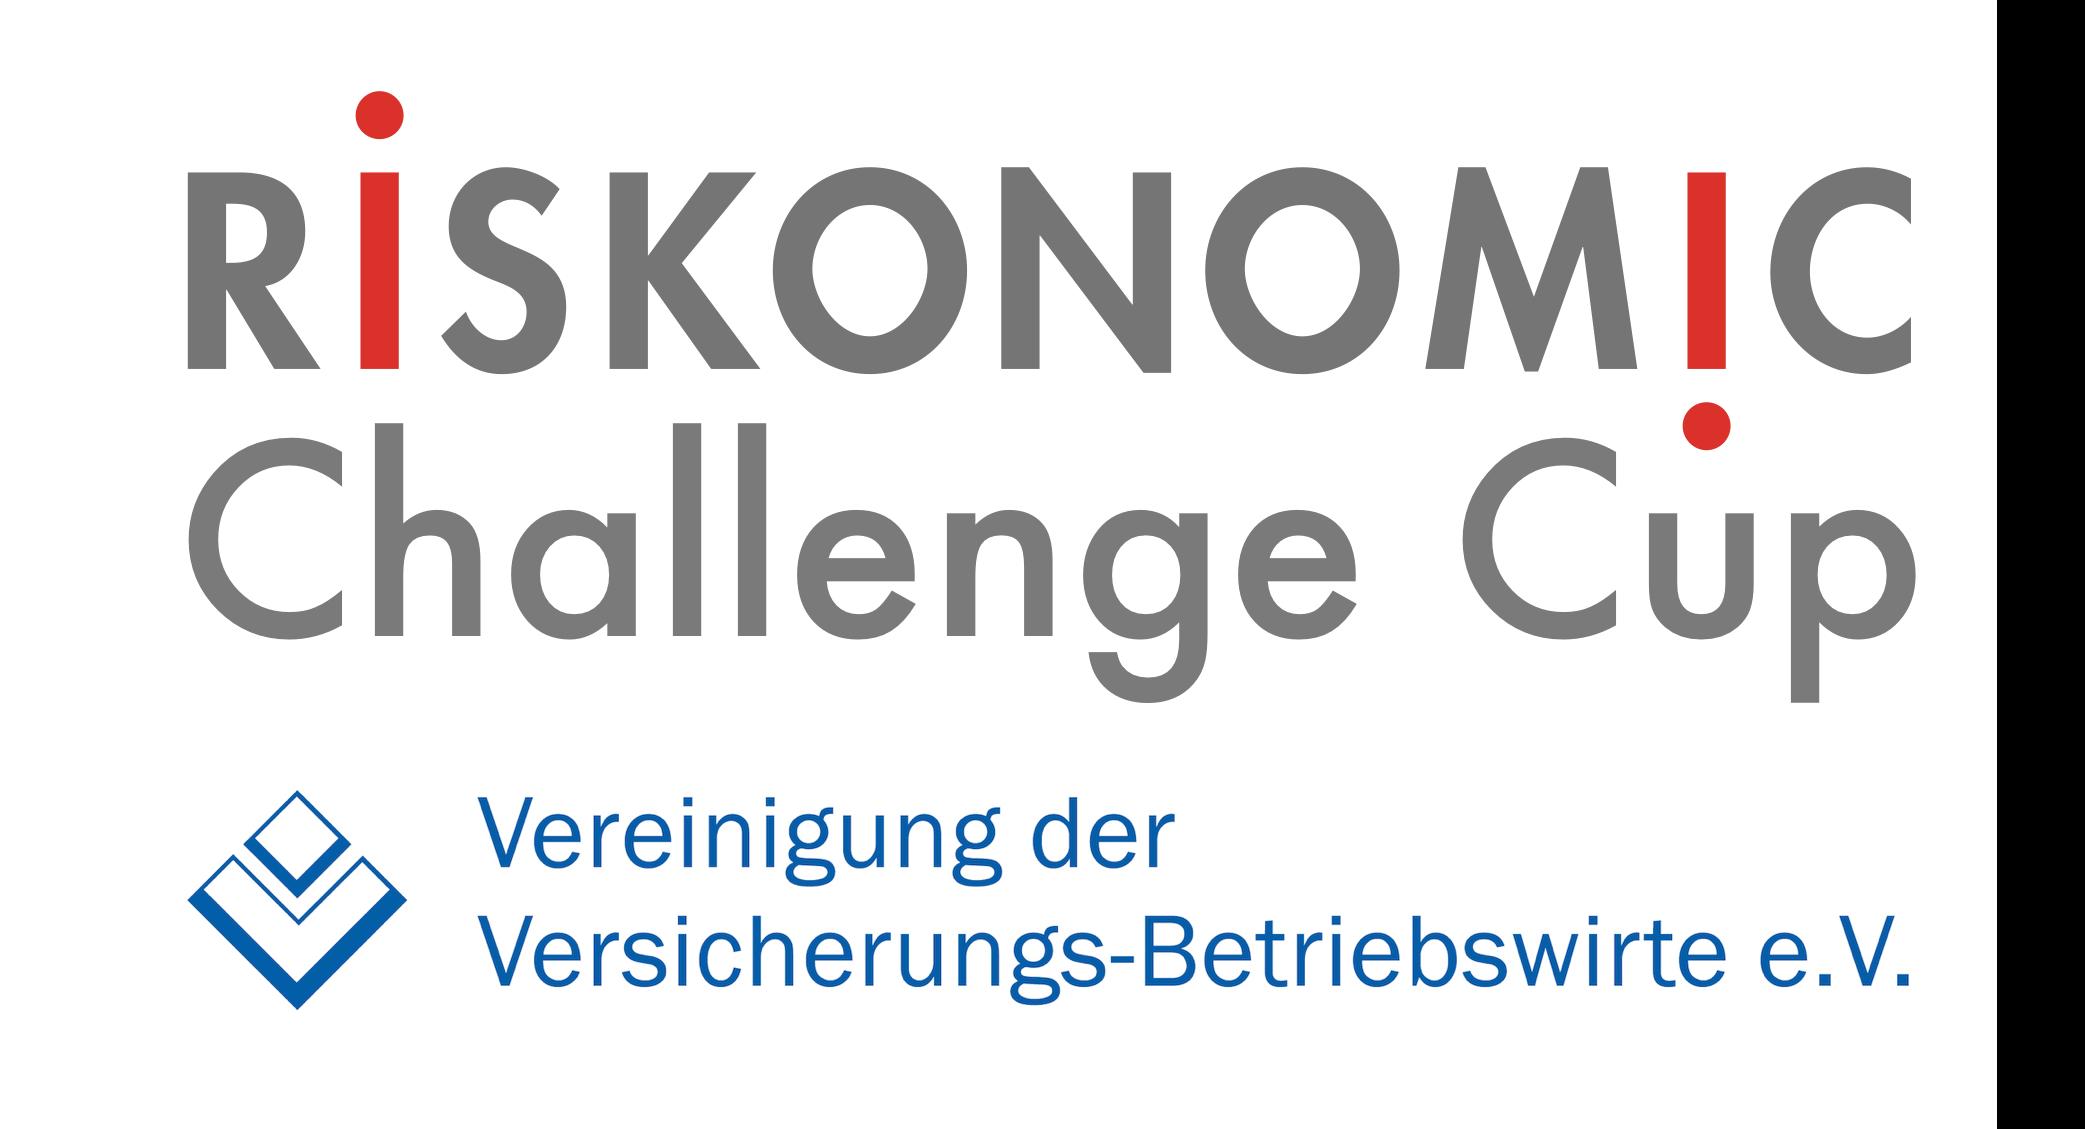 RISKONOMIC Challenge Cup